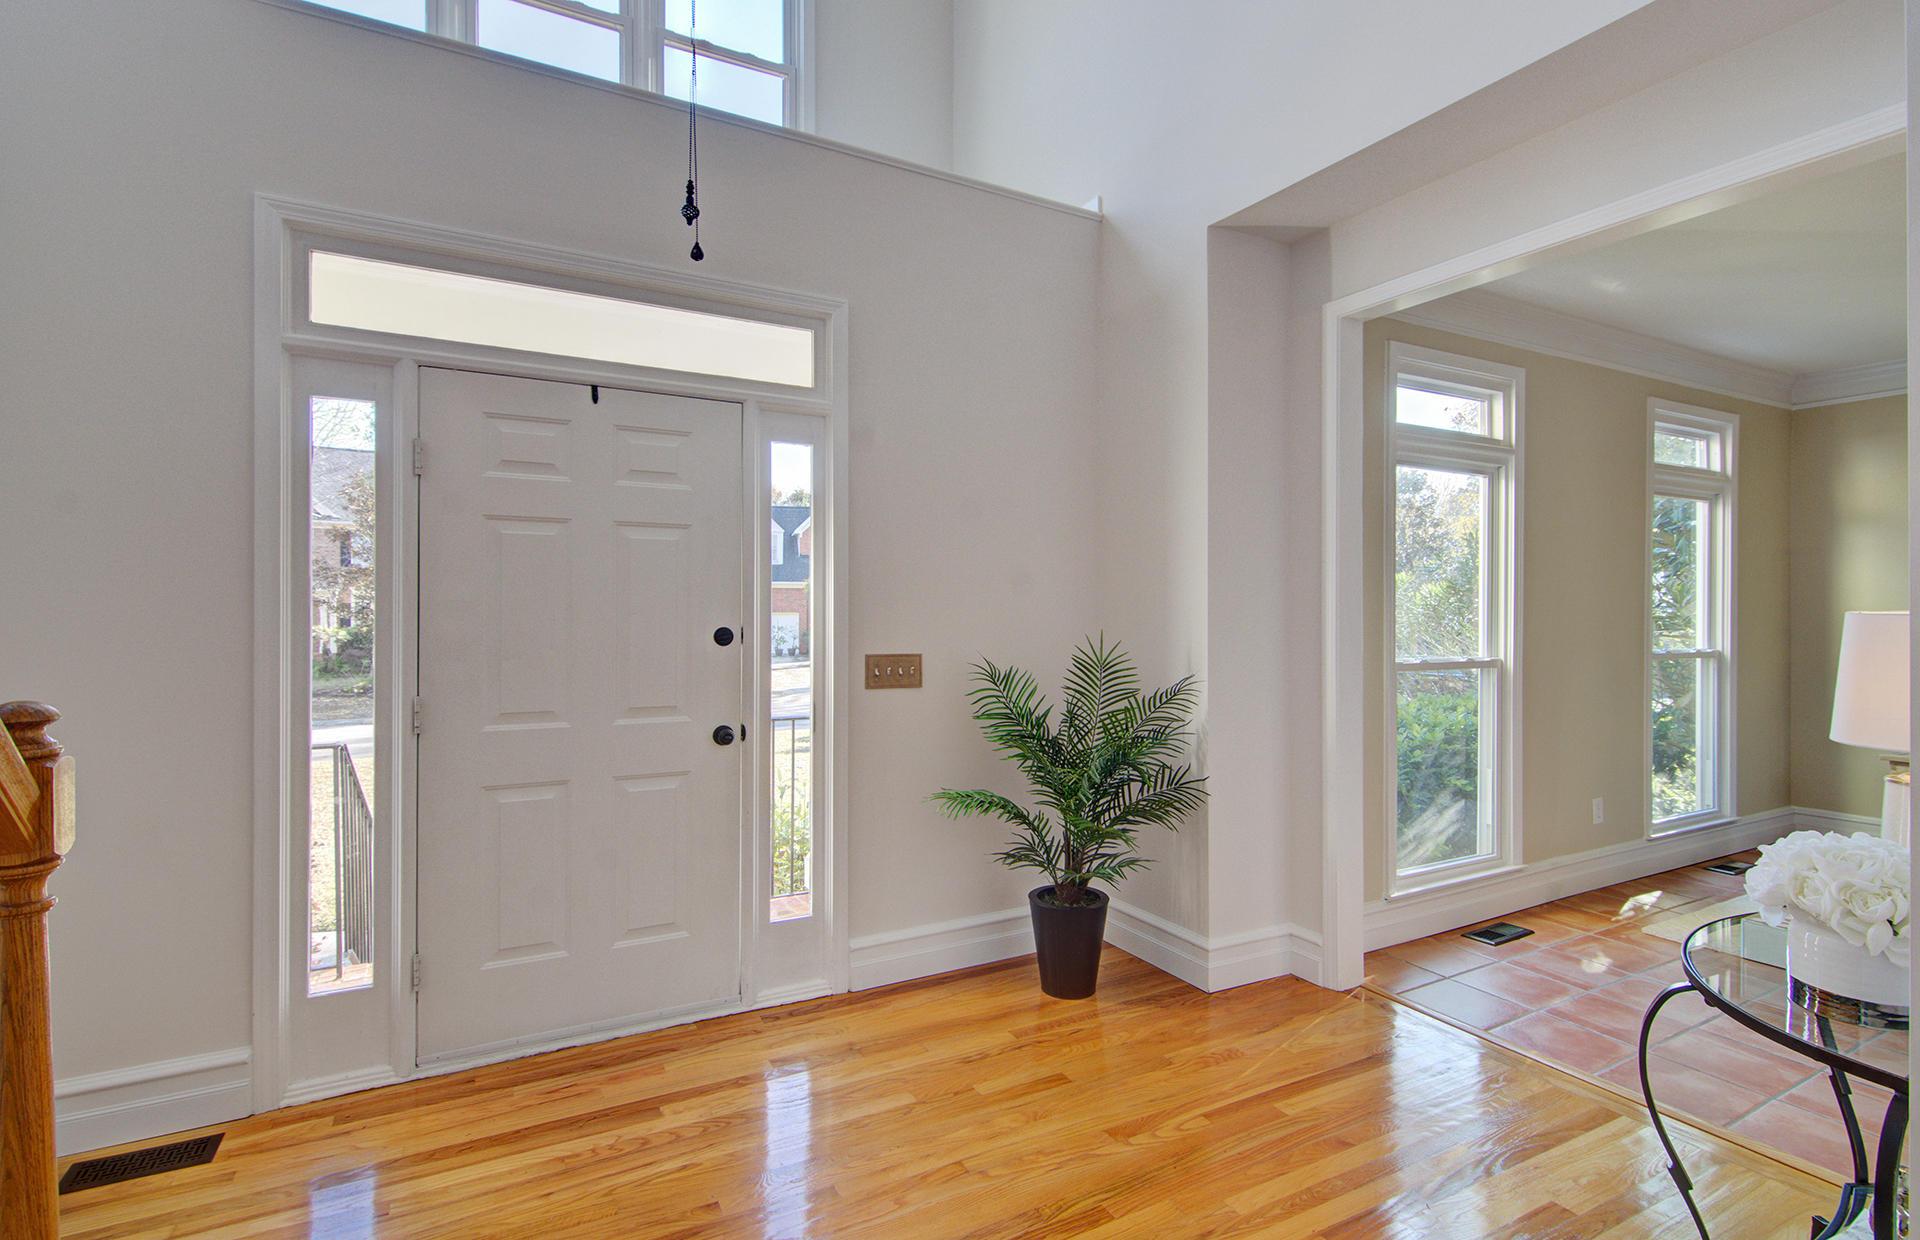 Brickyard Plantation Homes For Sale - 2796 Gaston Gate, Mount Pleasant, SC - 5